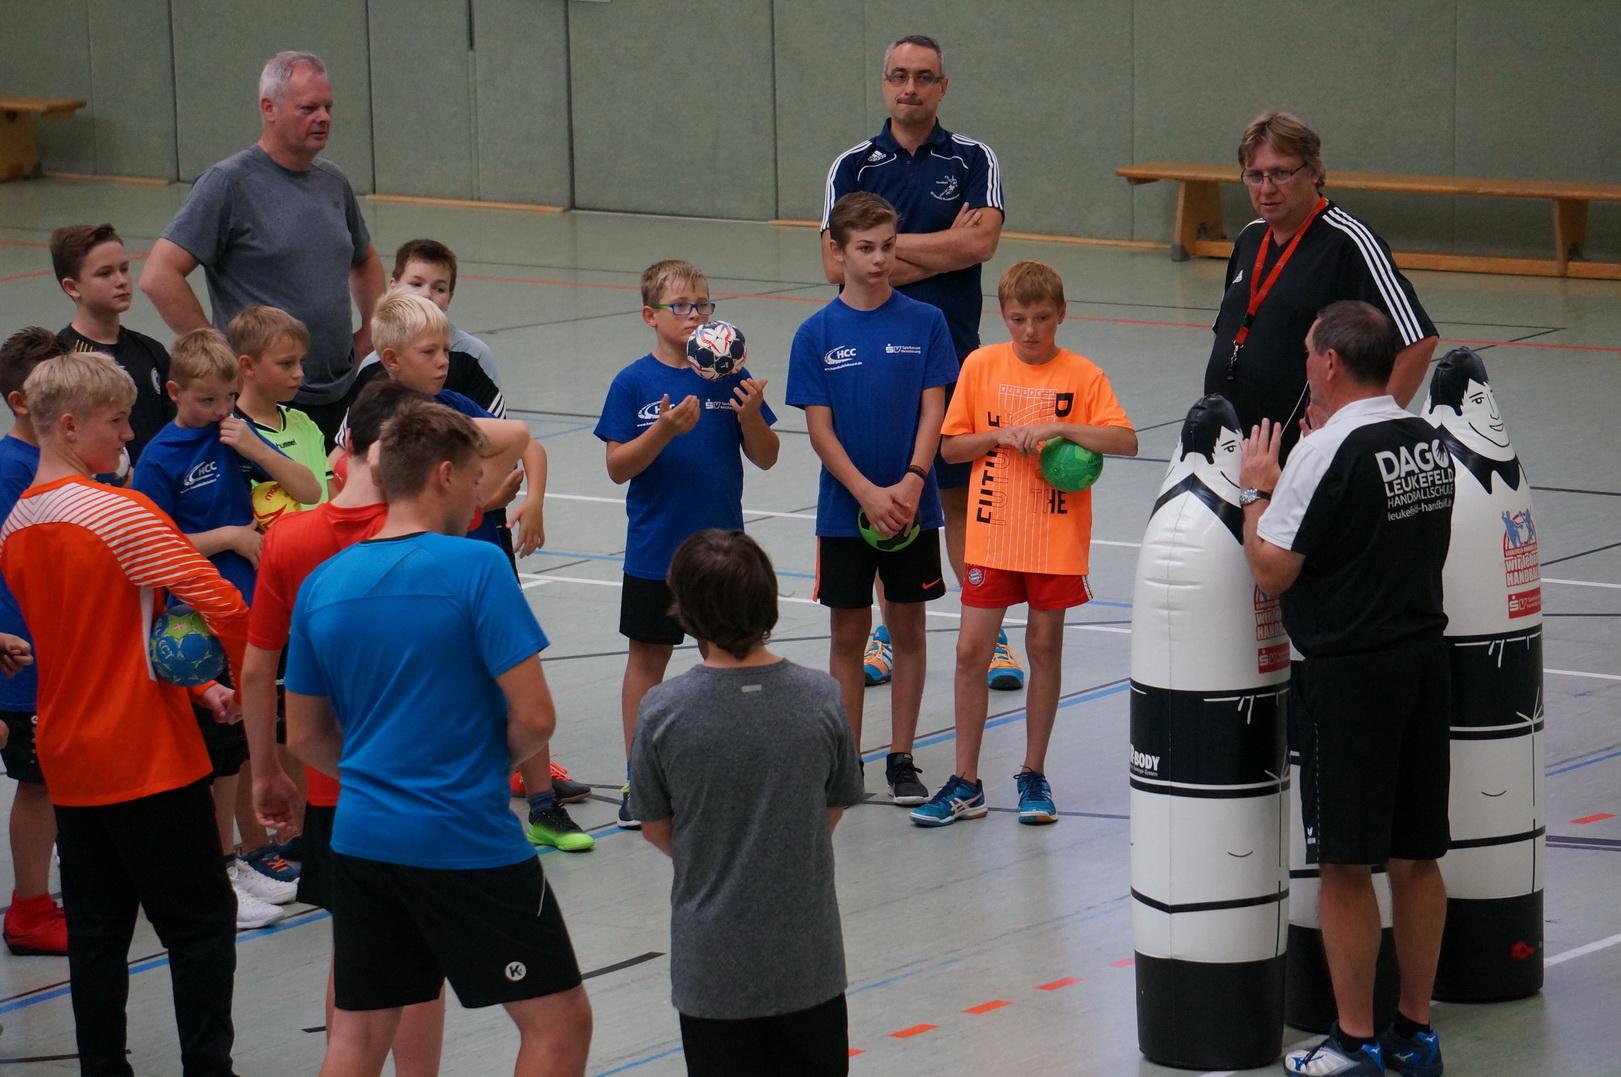 201808_Handballcamp_SDH_MG_252w